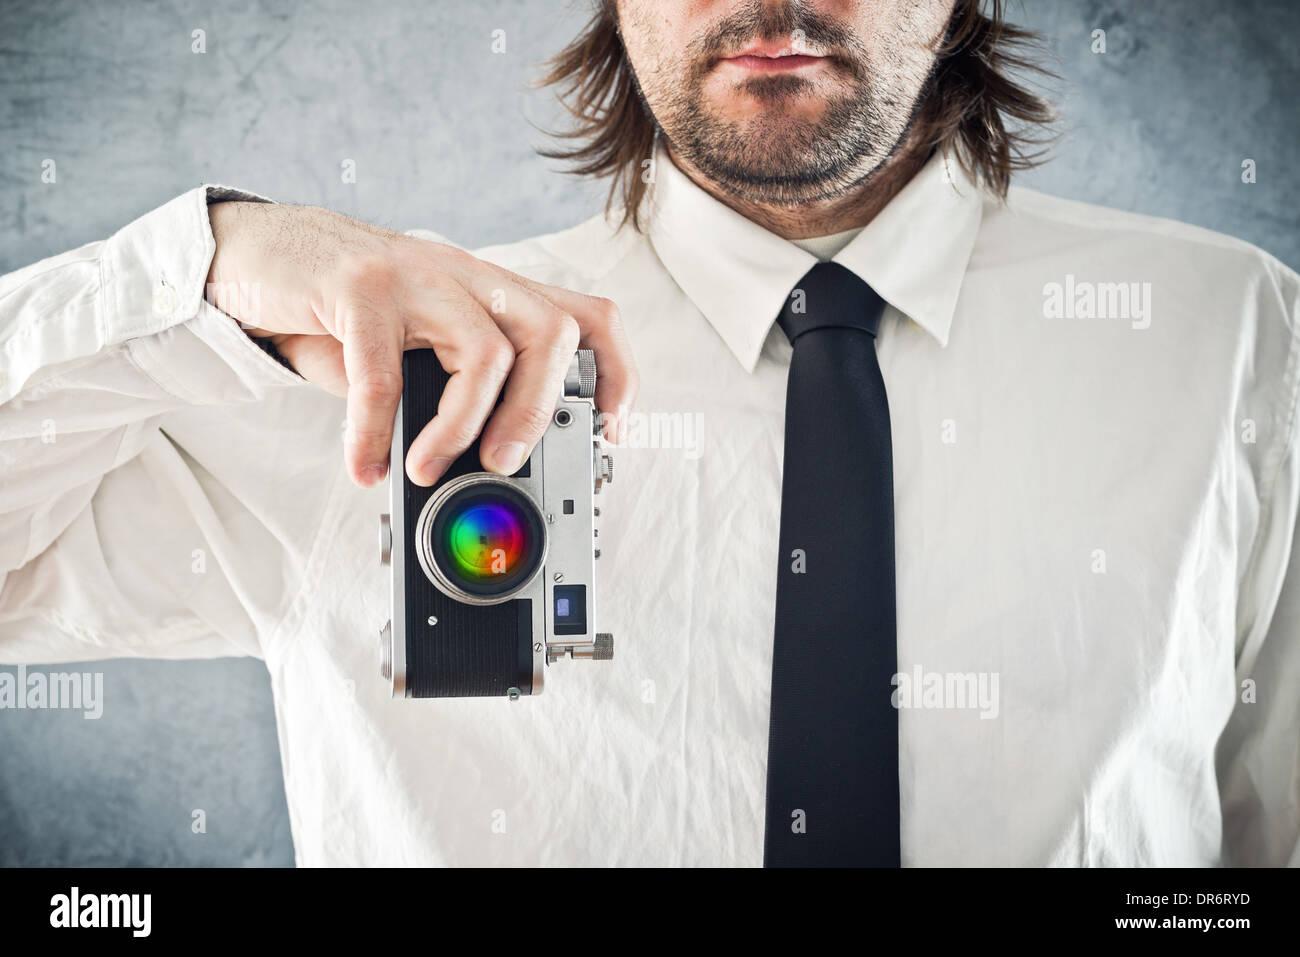 Kaufmann unter Bild mit Retro-Style-Foto-Kamera Stockbild